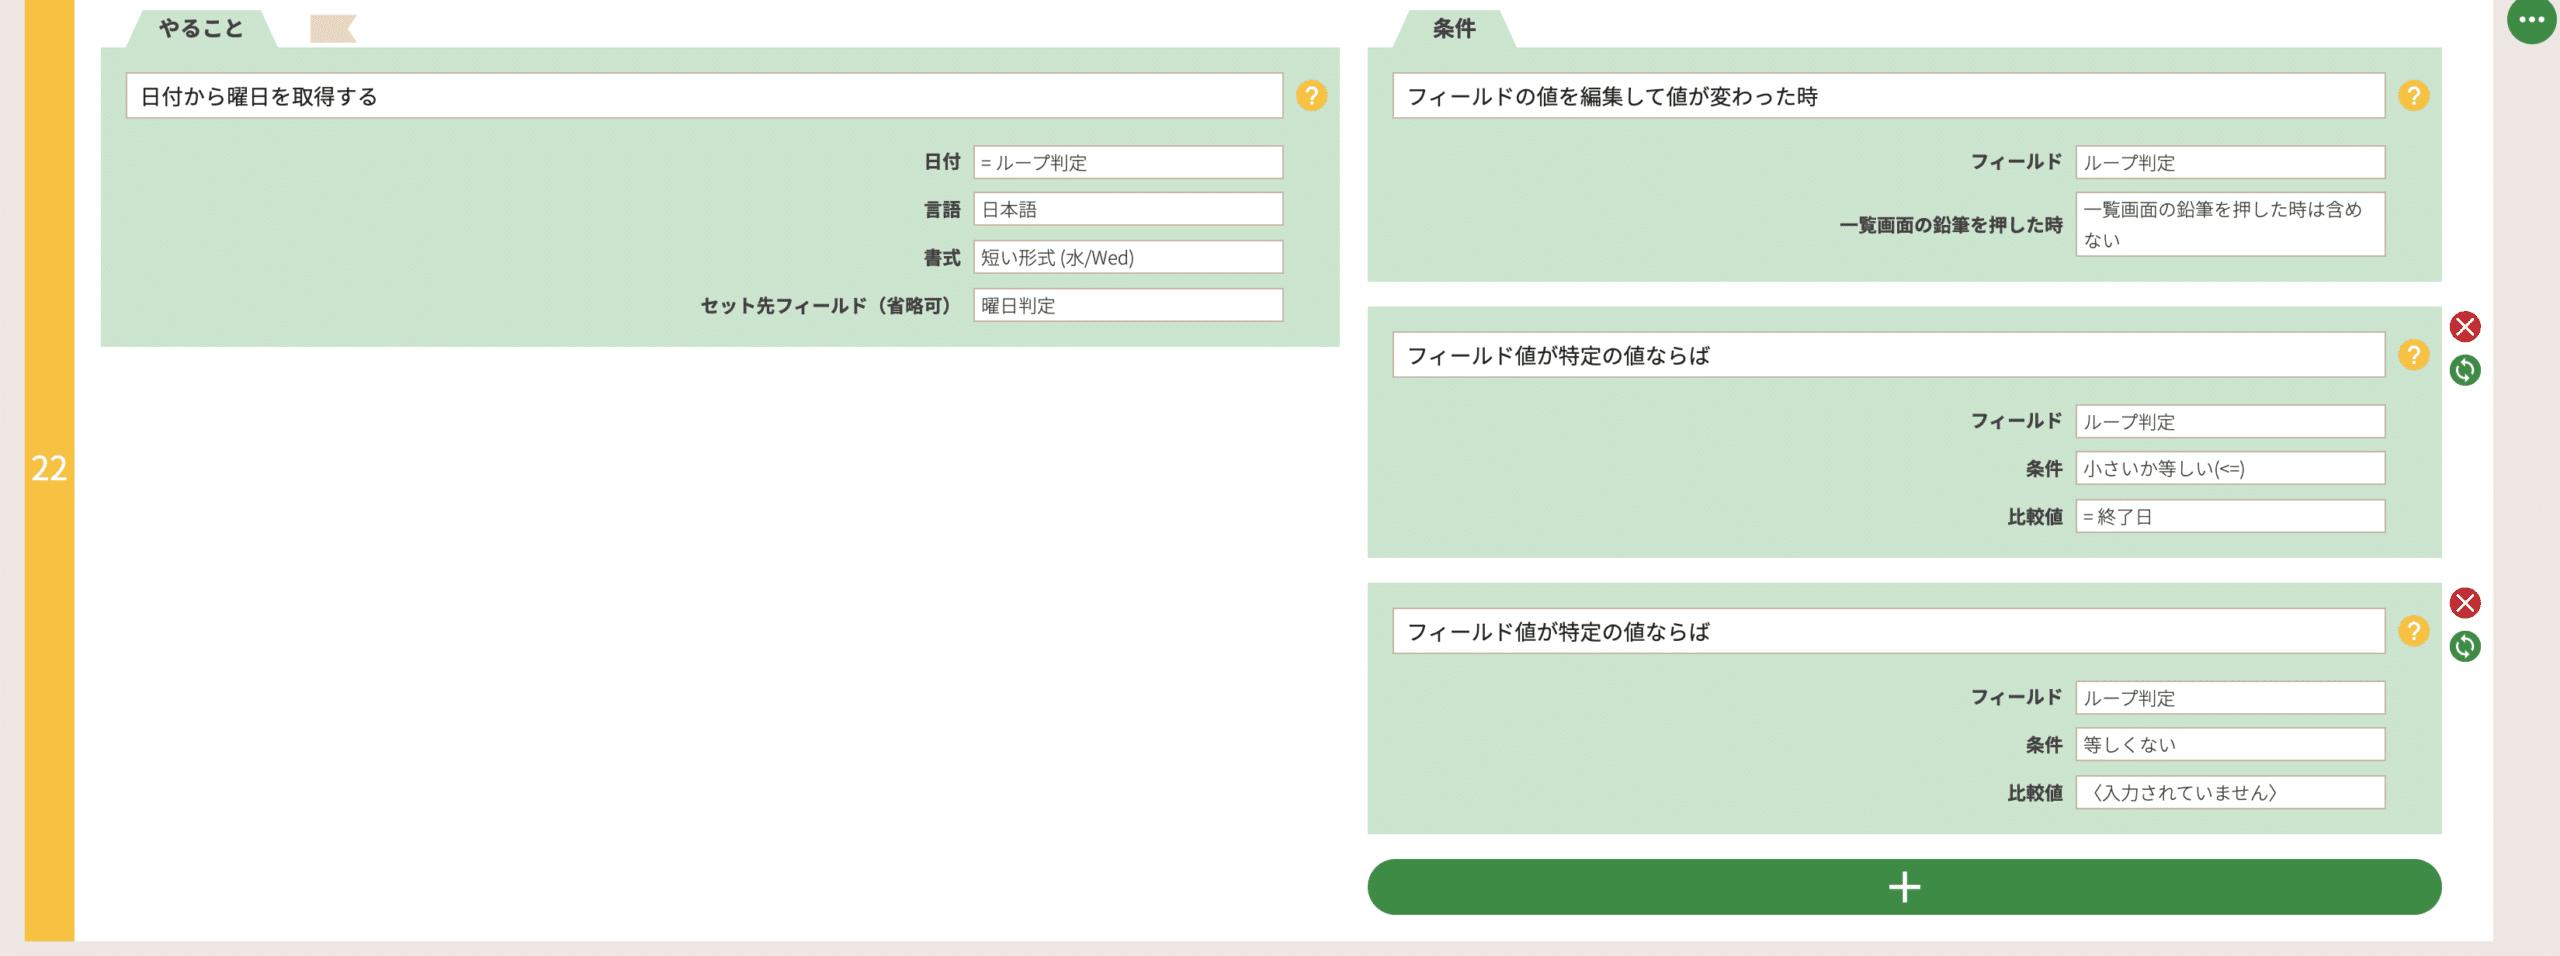 Customineループ判定